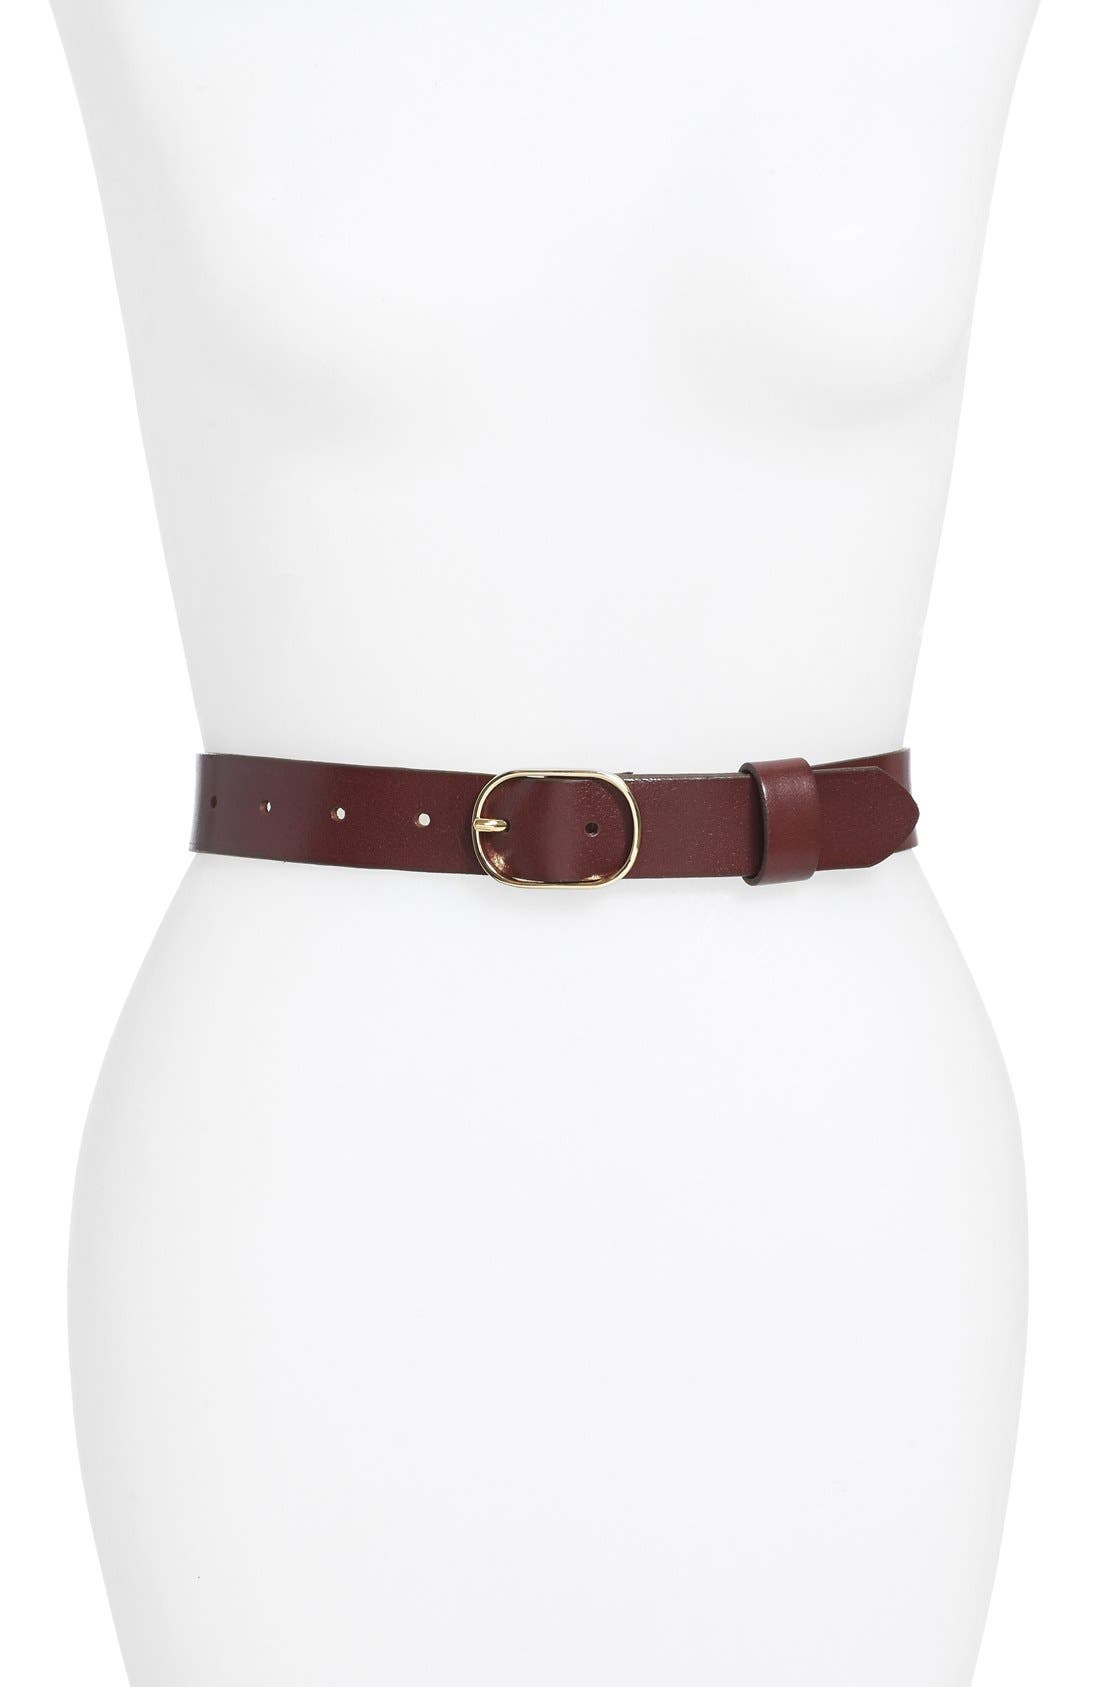 Tailored Trouser Leather Belt,                         Main,                         color, BURGUNDY STEM